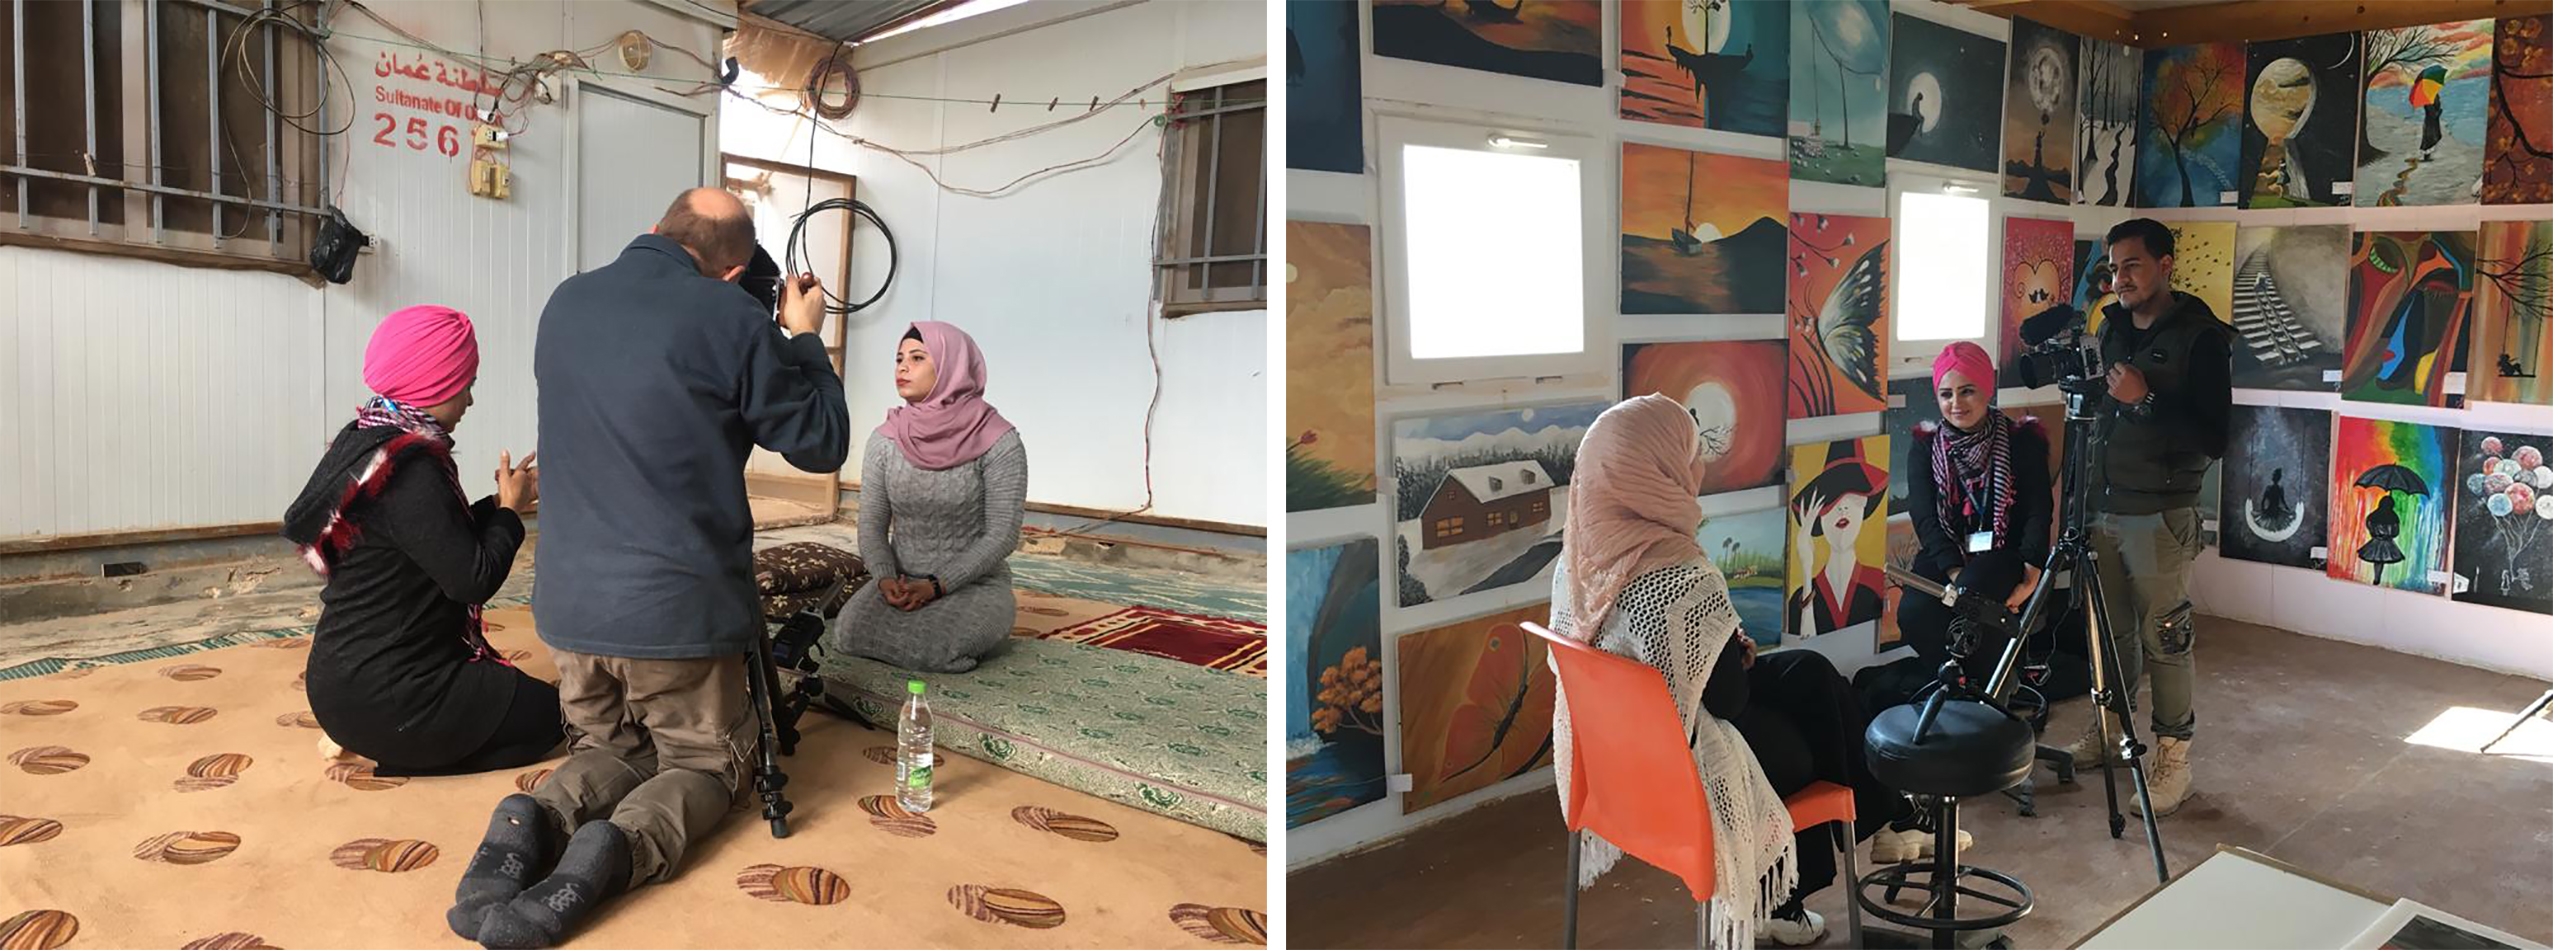 Youseff filming girls in zaatari refugee camp